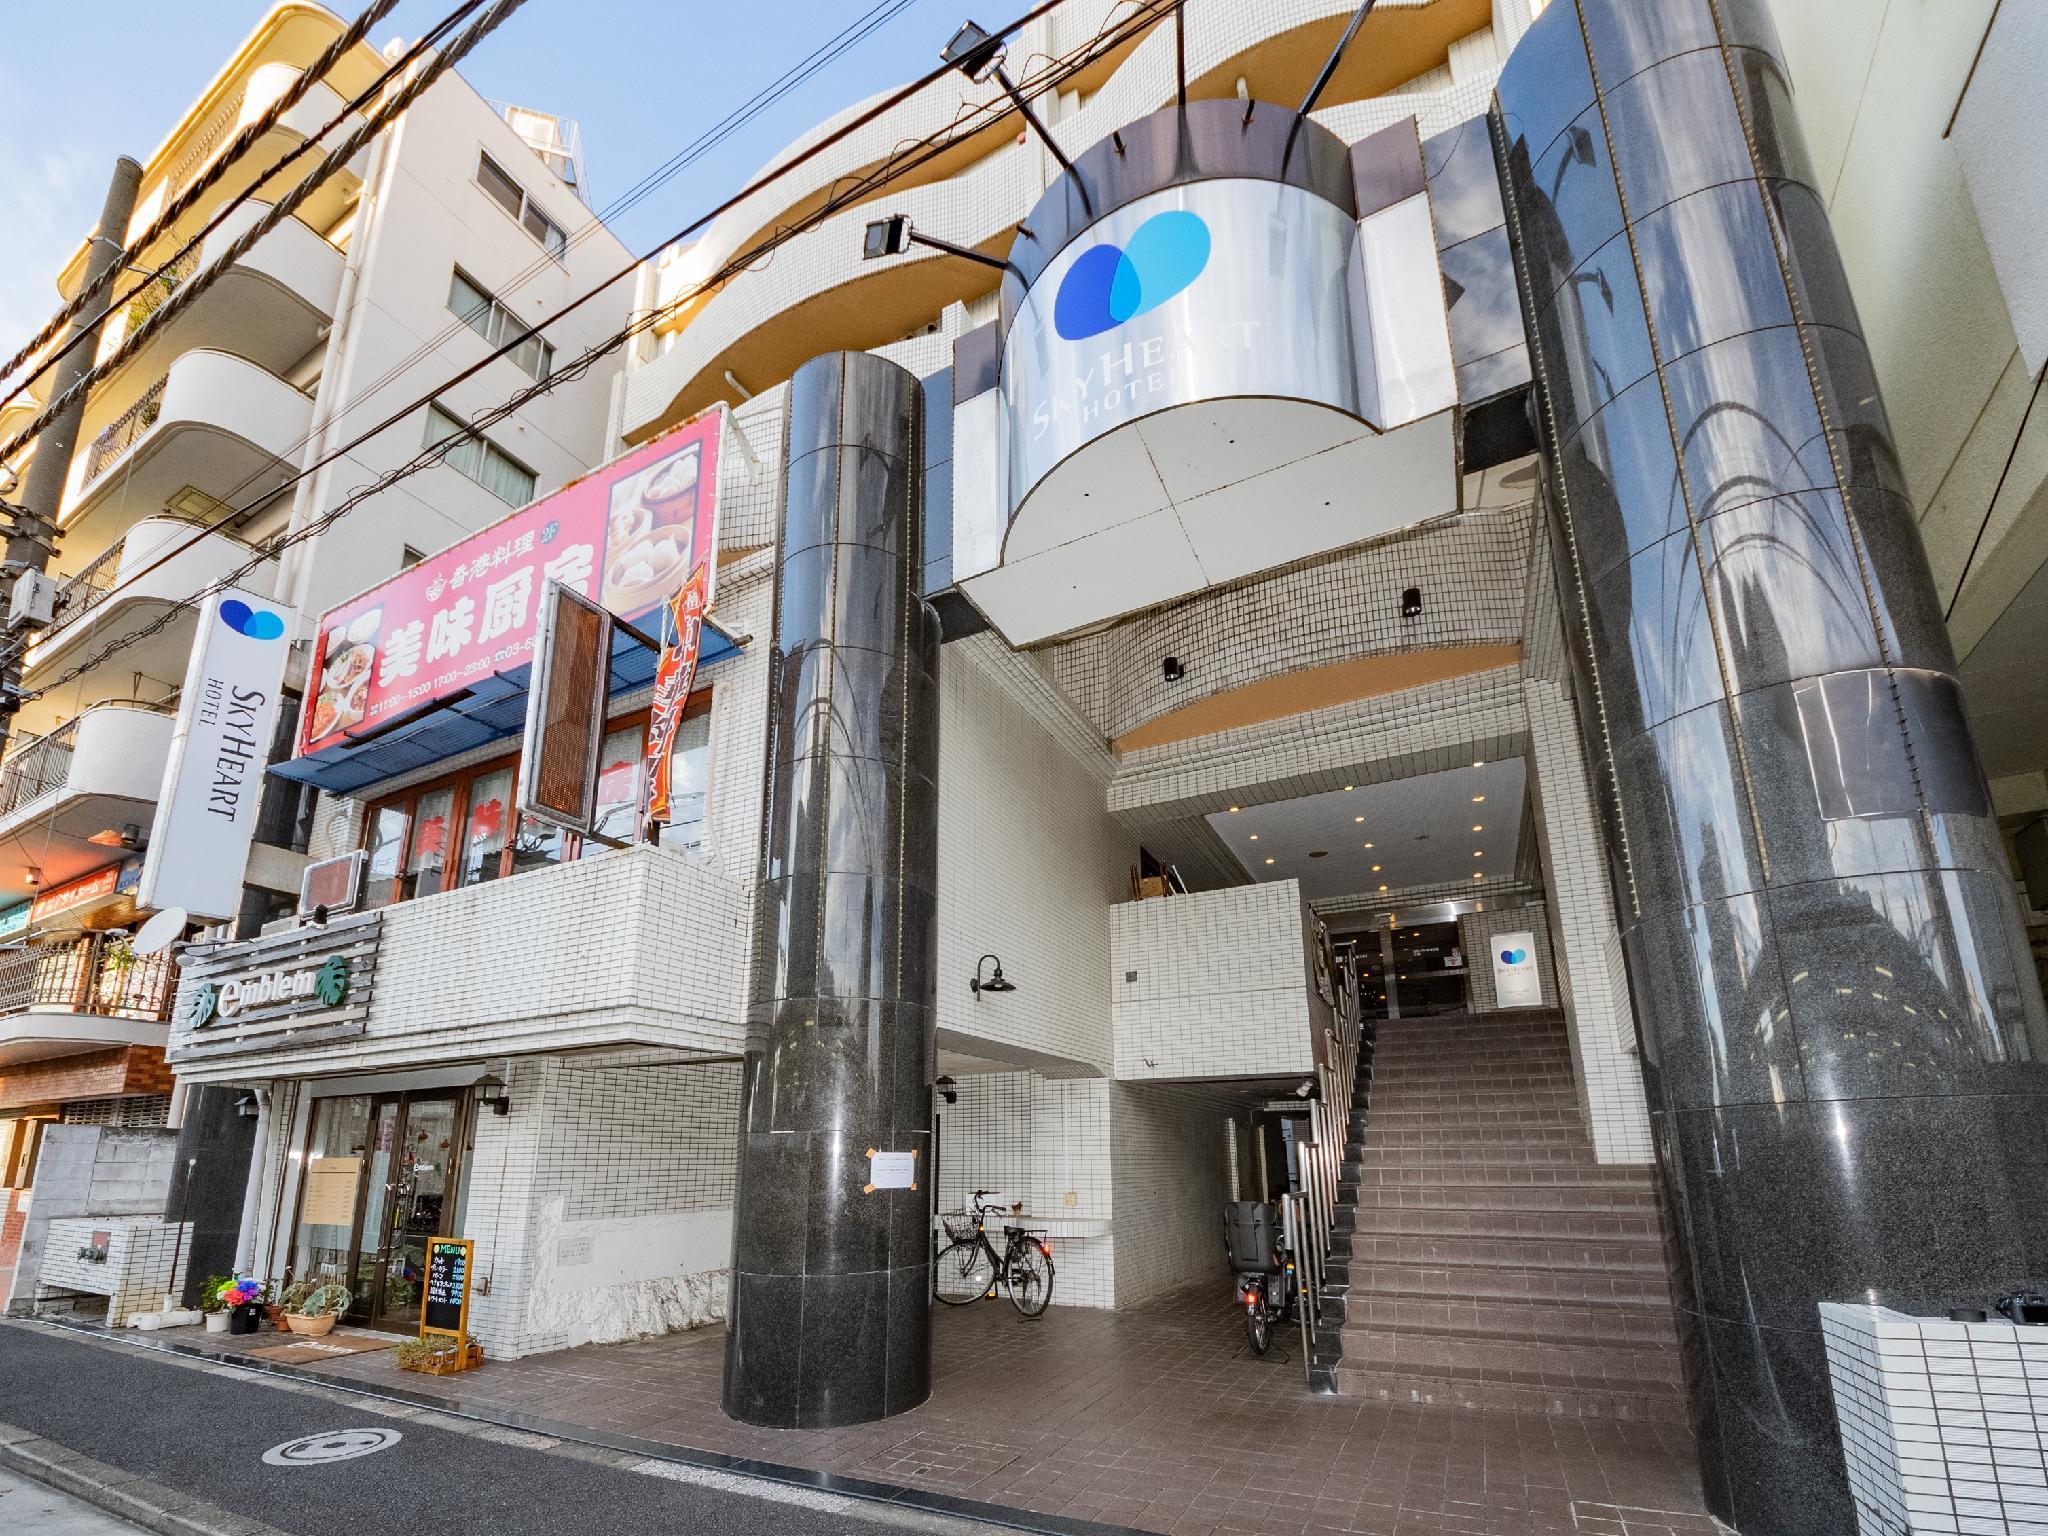 SkyHeart Hotel Koiwa, Katsushika